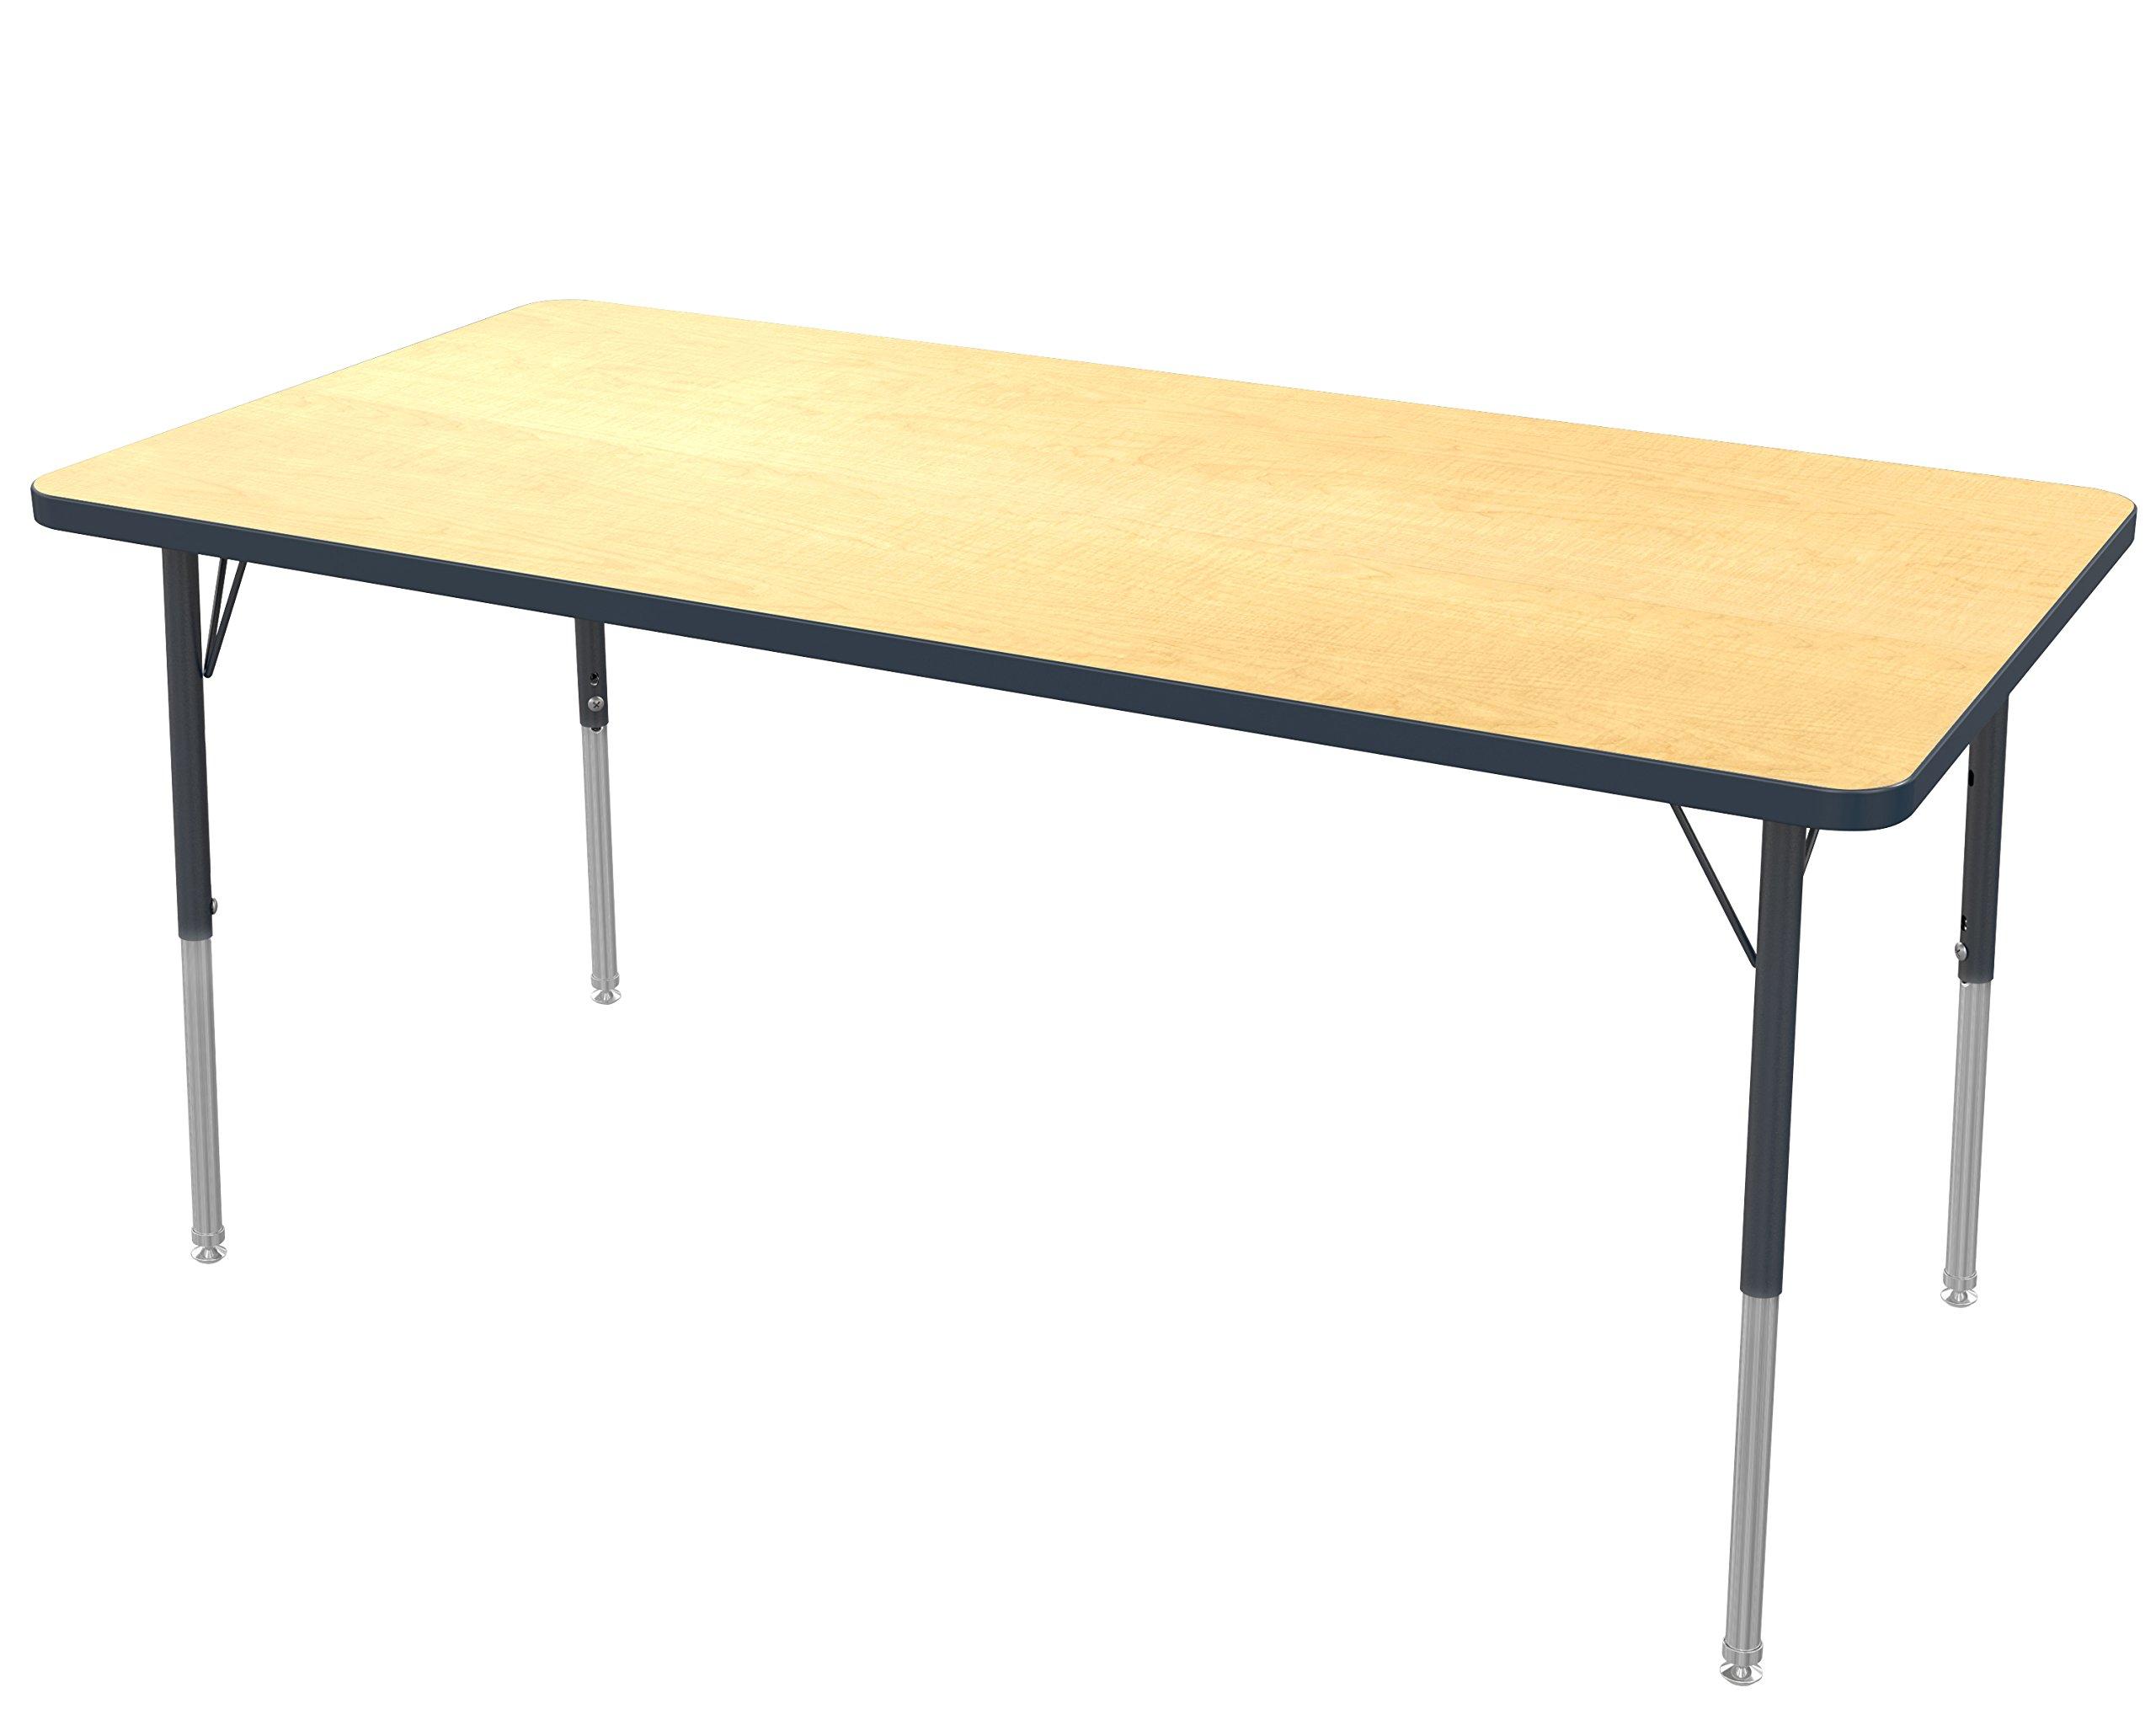 "Marco Group MGA2237-50-BBLK 30"" x 60"" Rectangular Adjustable Height Classroom Activity Tables (21""- 30"") Standard Size, Fusion Maple -Top, Black-Edge, Black-Leg"